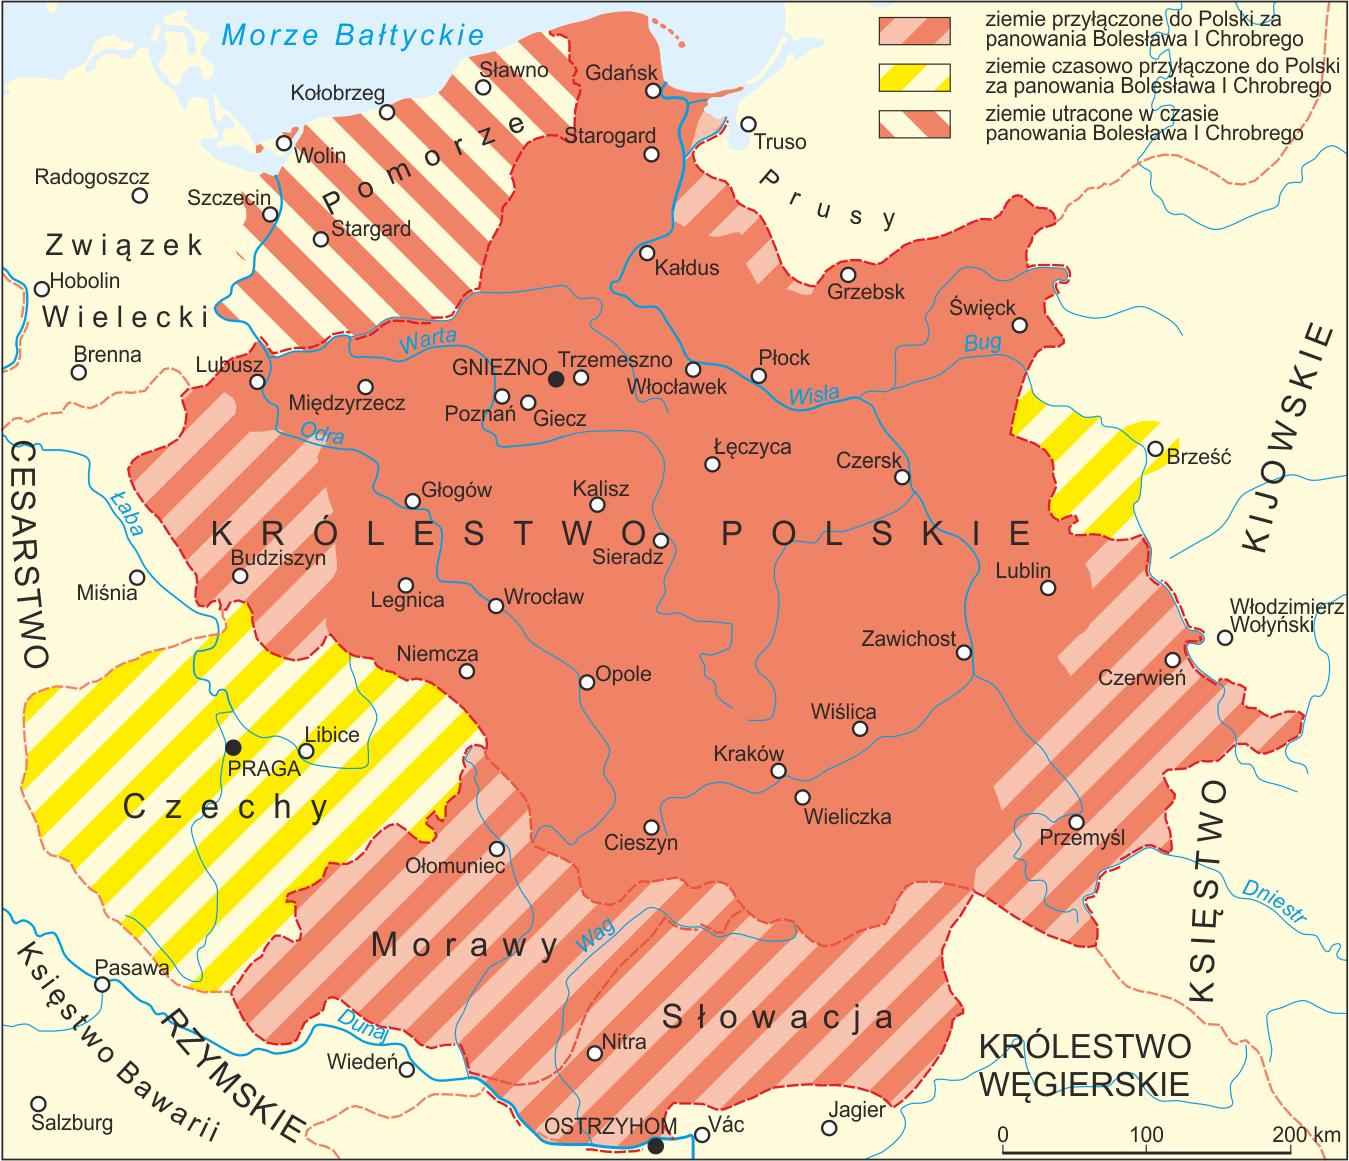 Poland_992-1025_map_PL.png